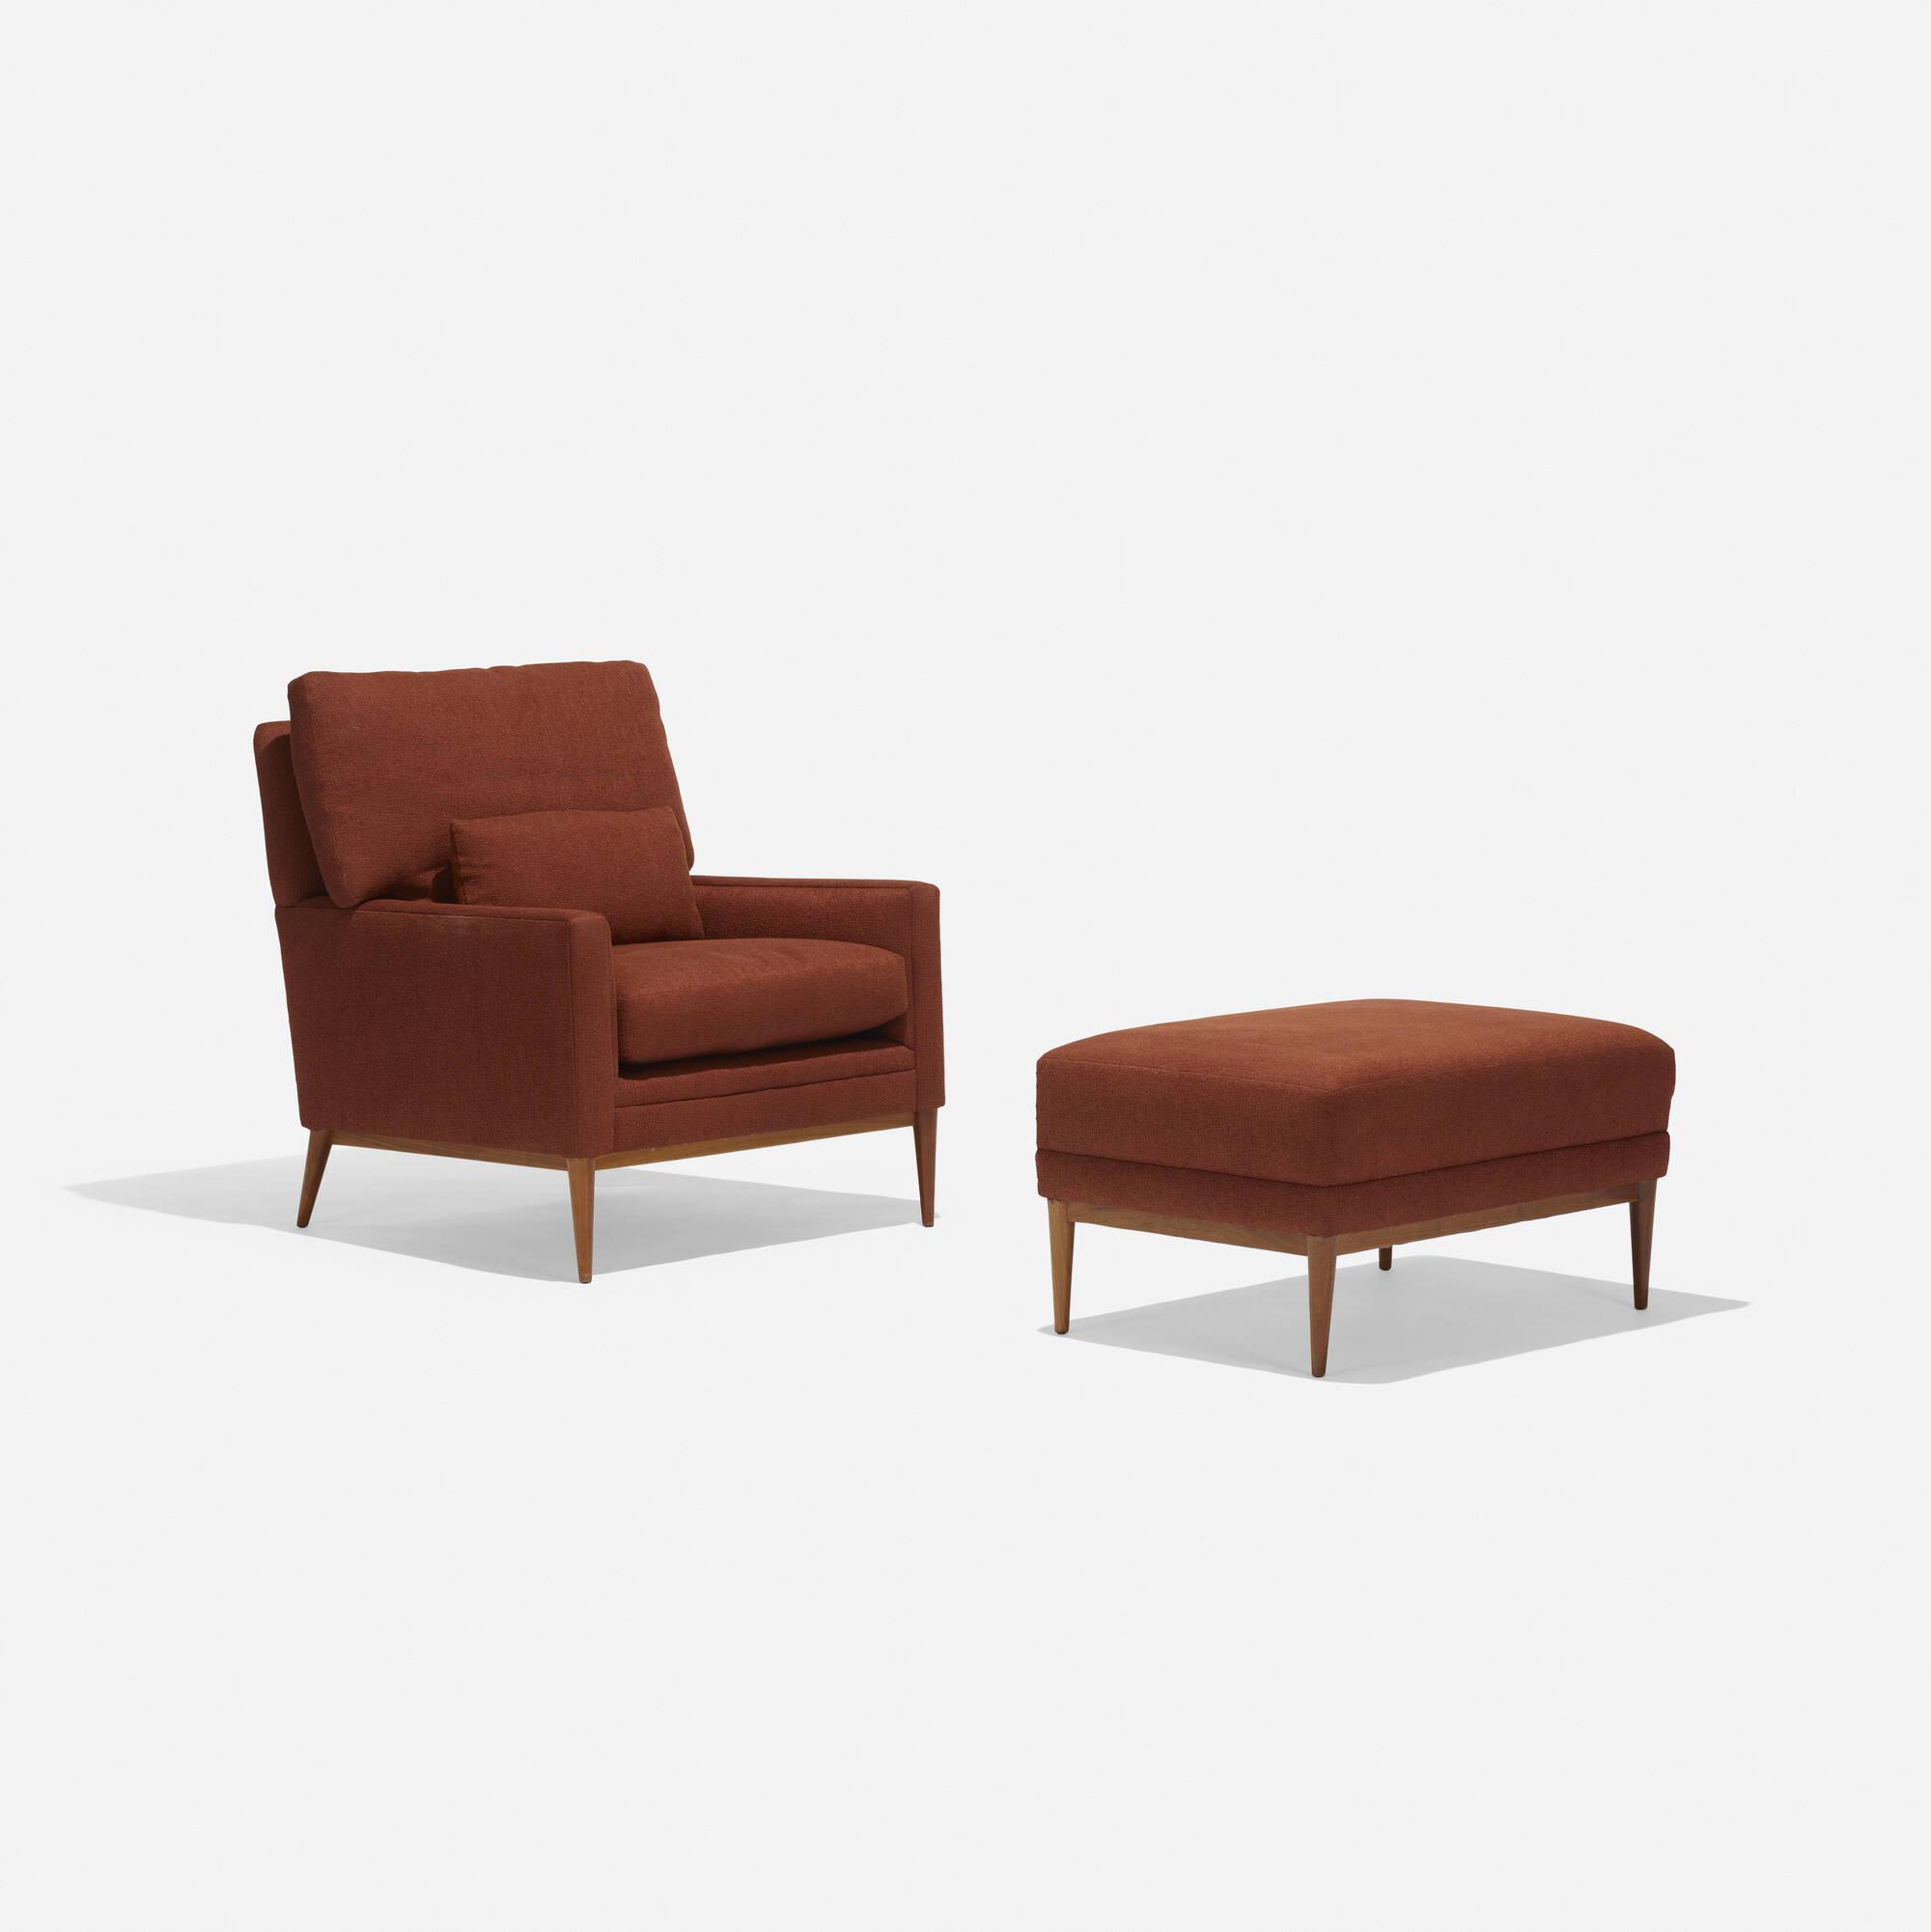 e34642800c81 242  Paul McCobb   armchair